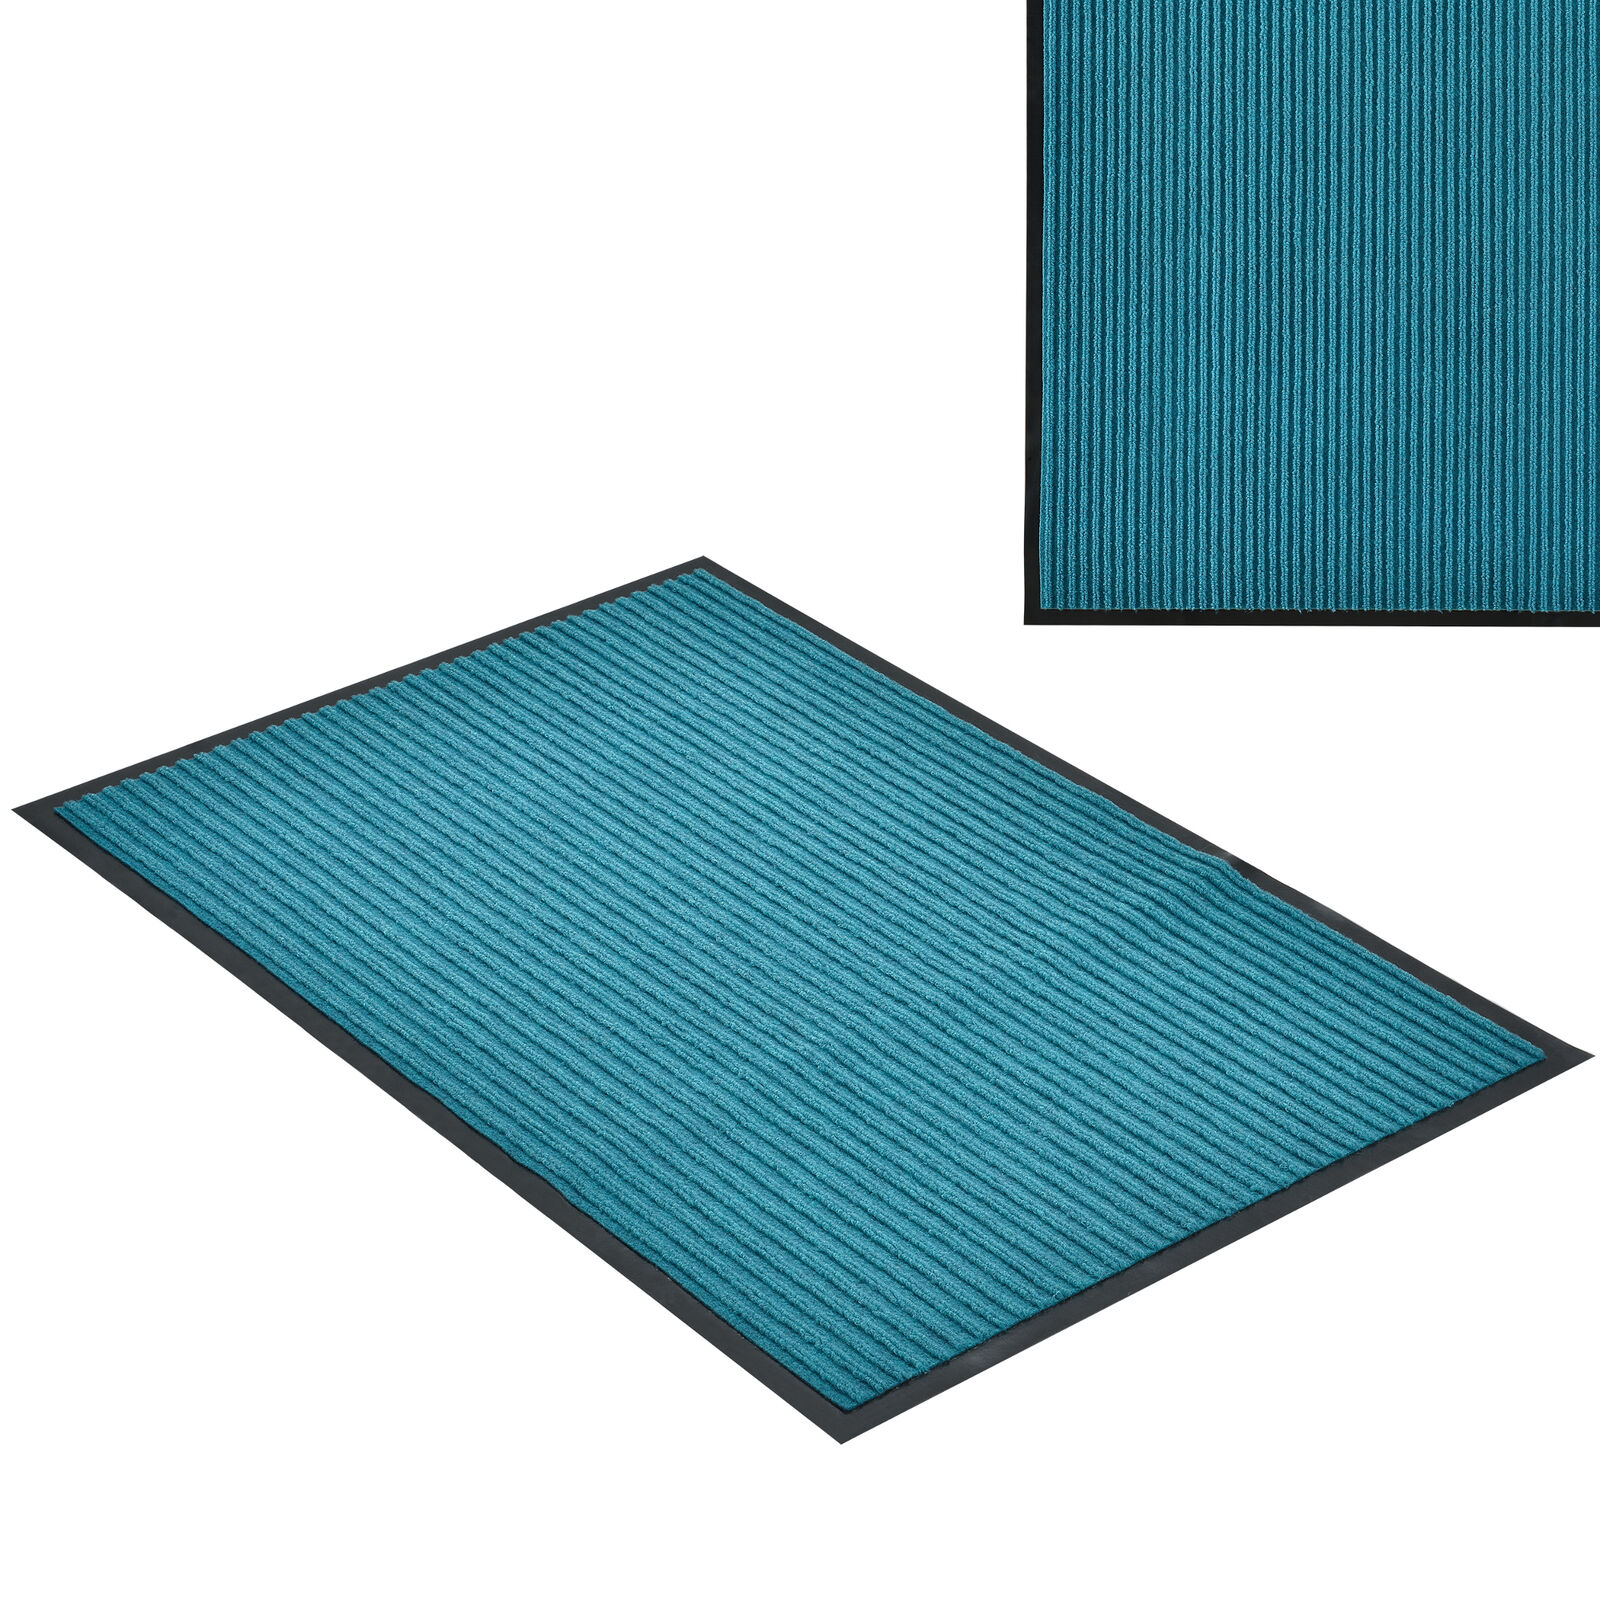 [en.casa]® Zerbino tappeto turchese 180x120cm tappetino stuoino tappeto Zerbino antiscivolo 94db5d